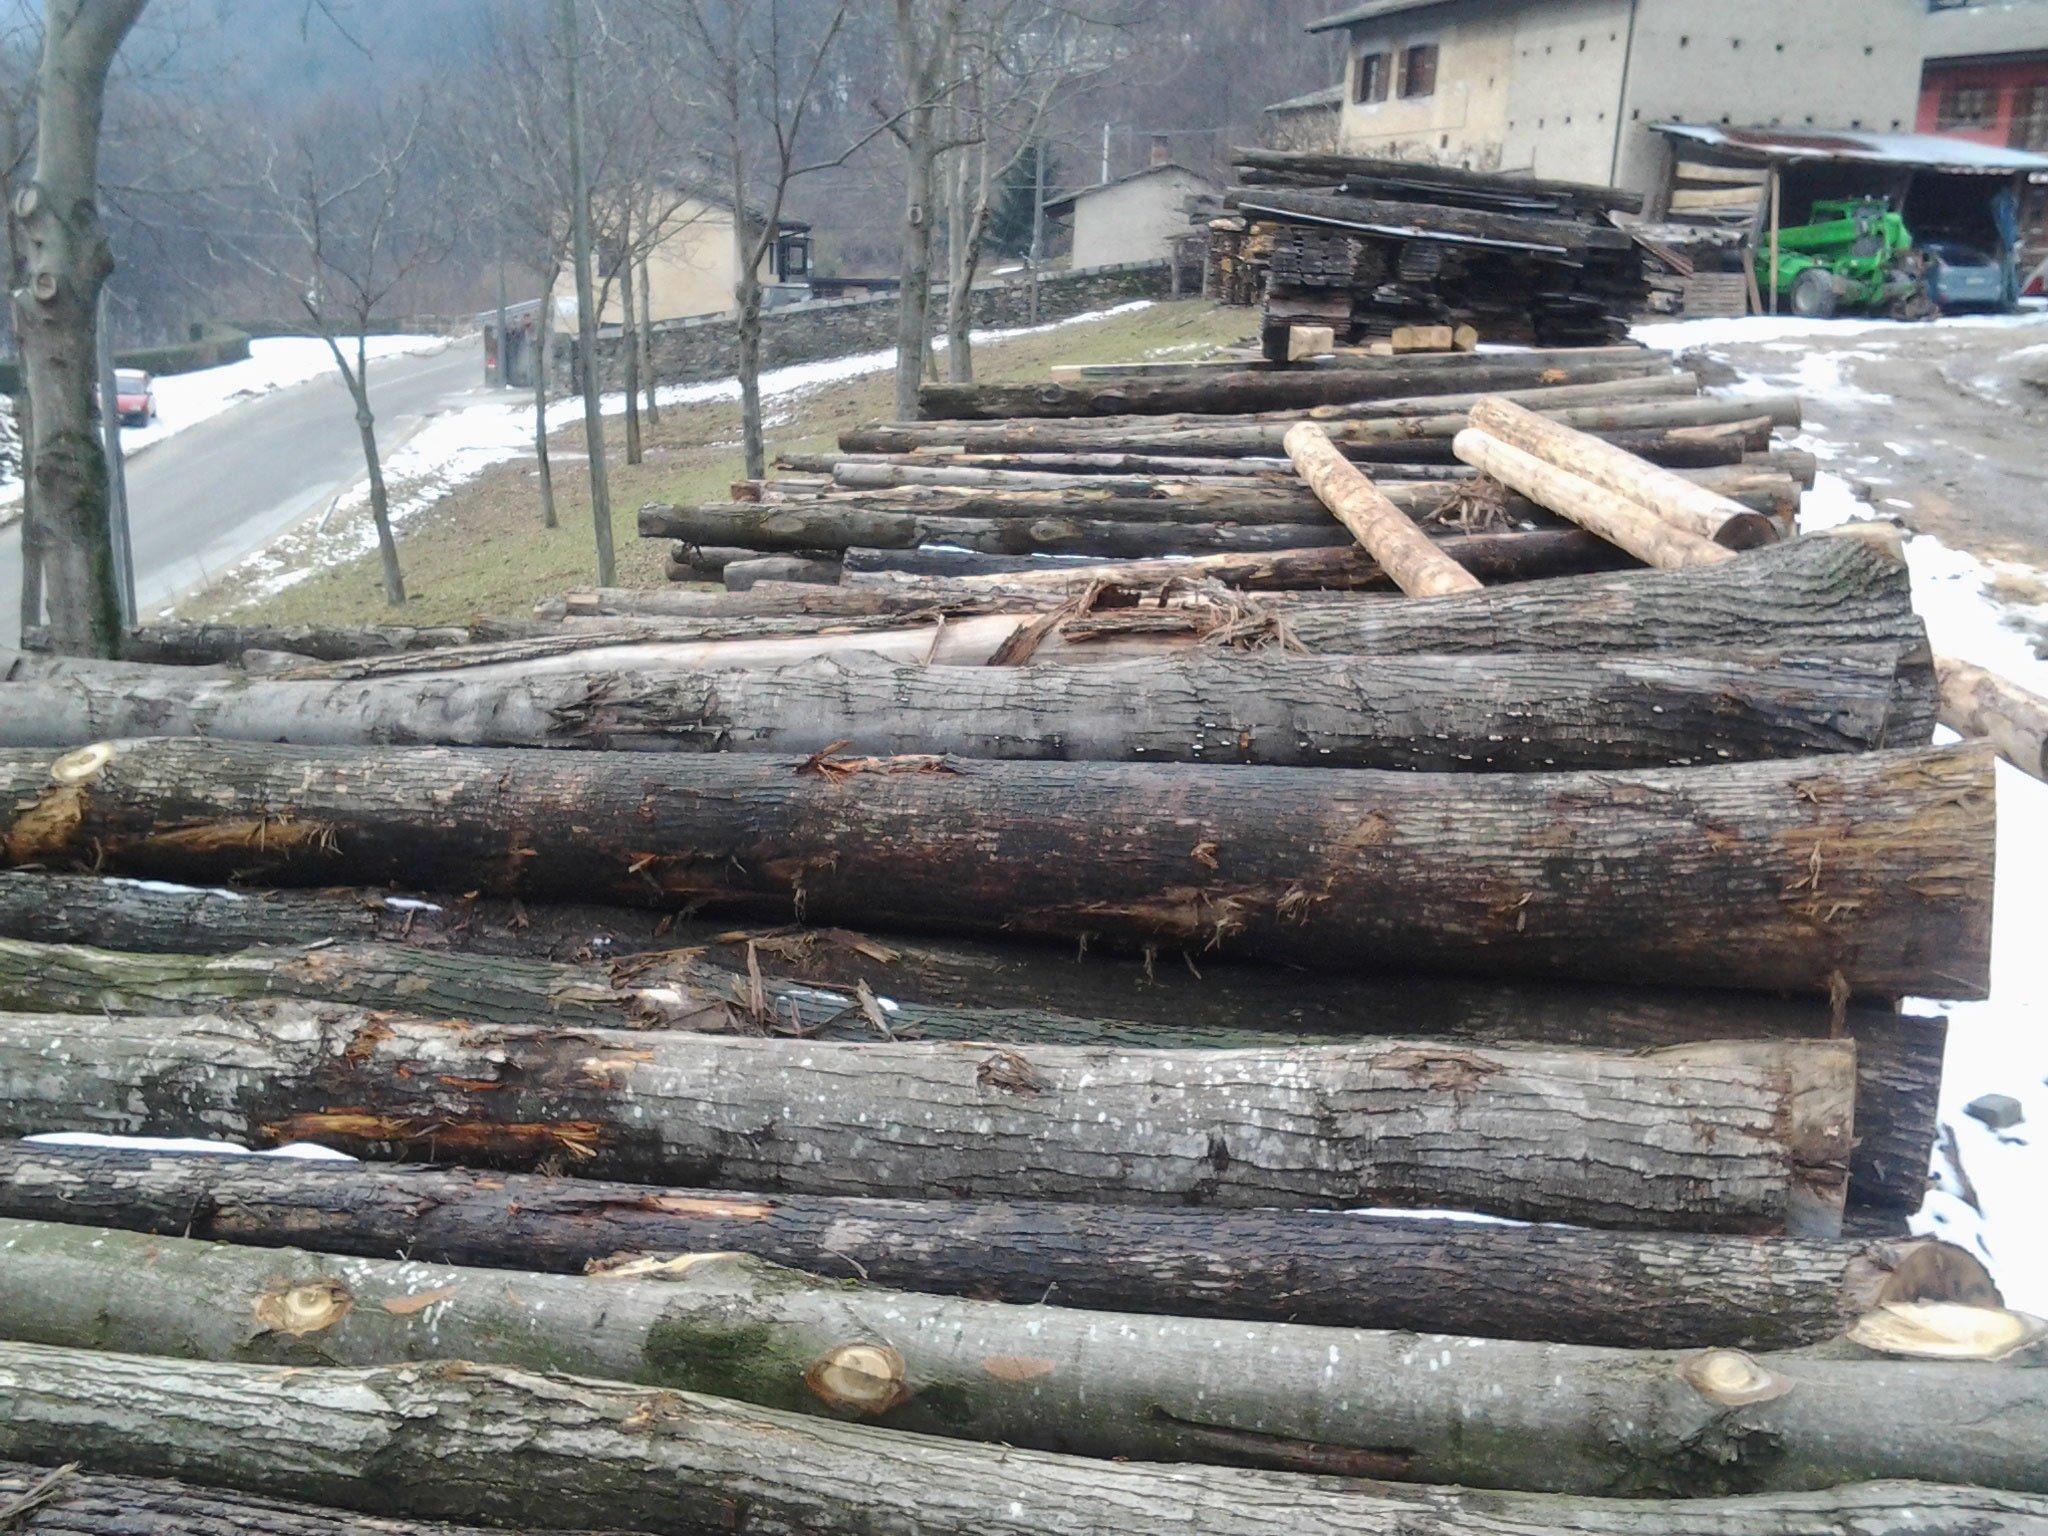 un insieme di tronchi d'albero